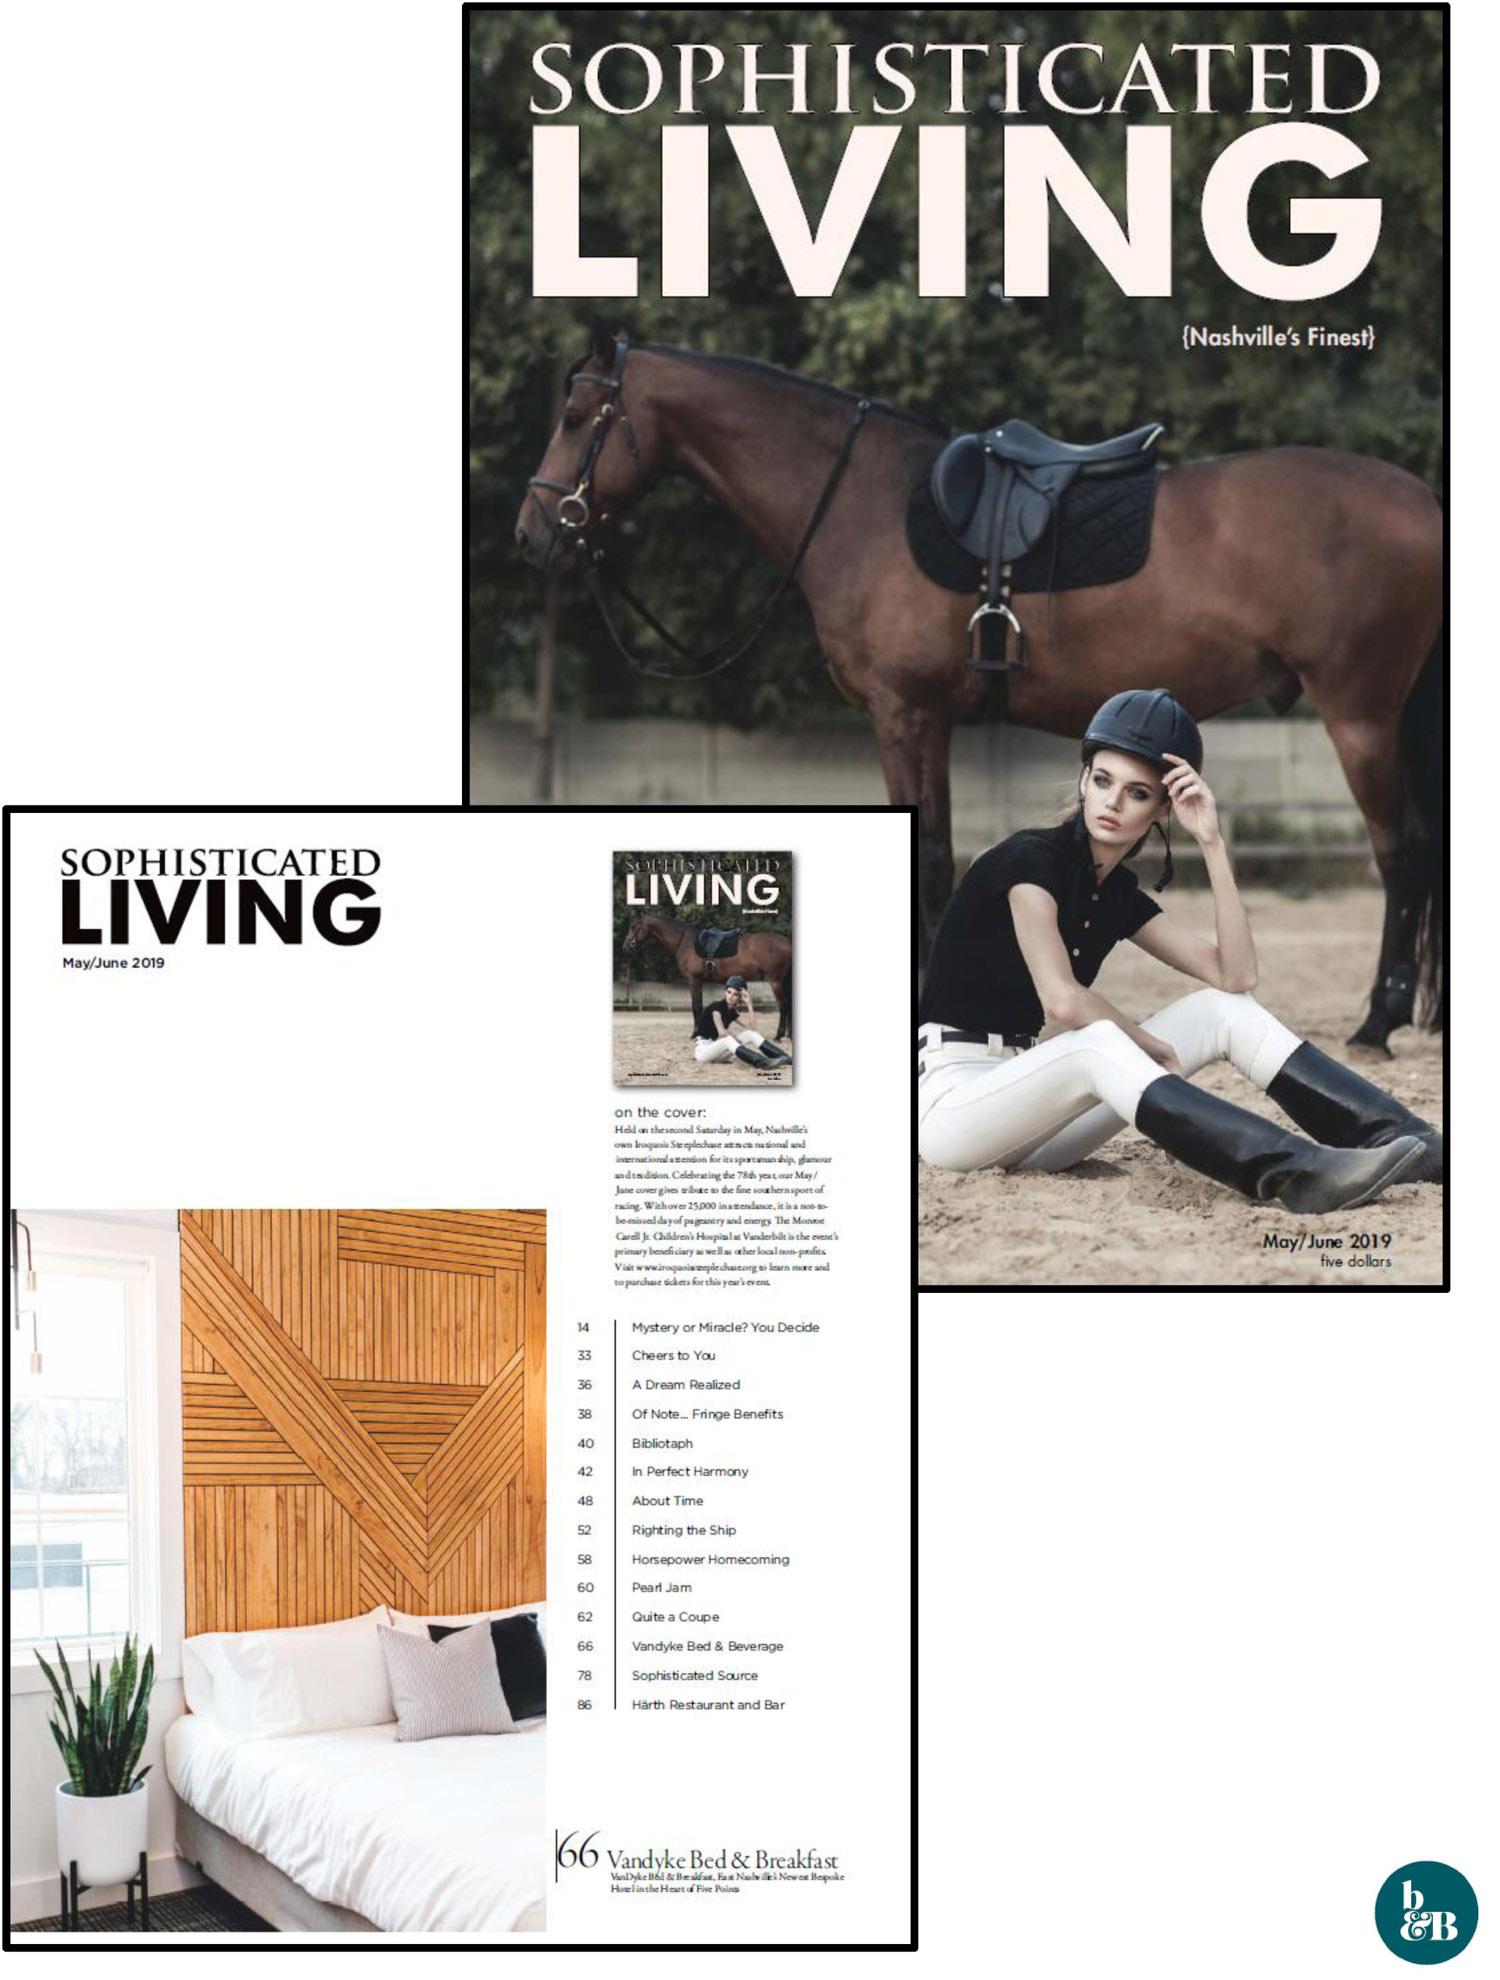 Sophisticated Living Nashville_Vandyke_May_June 2019-1.jpg